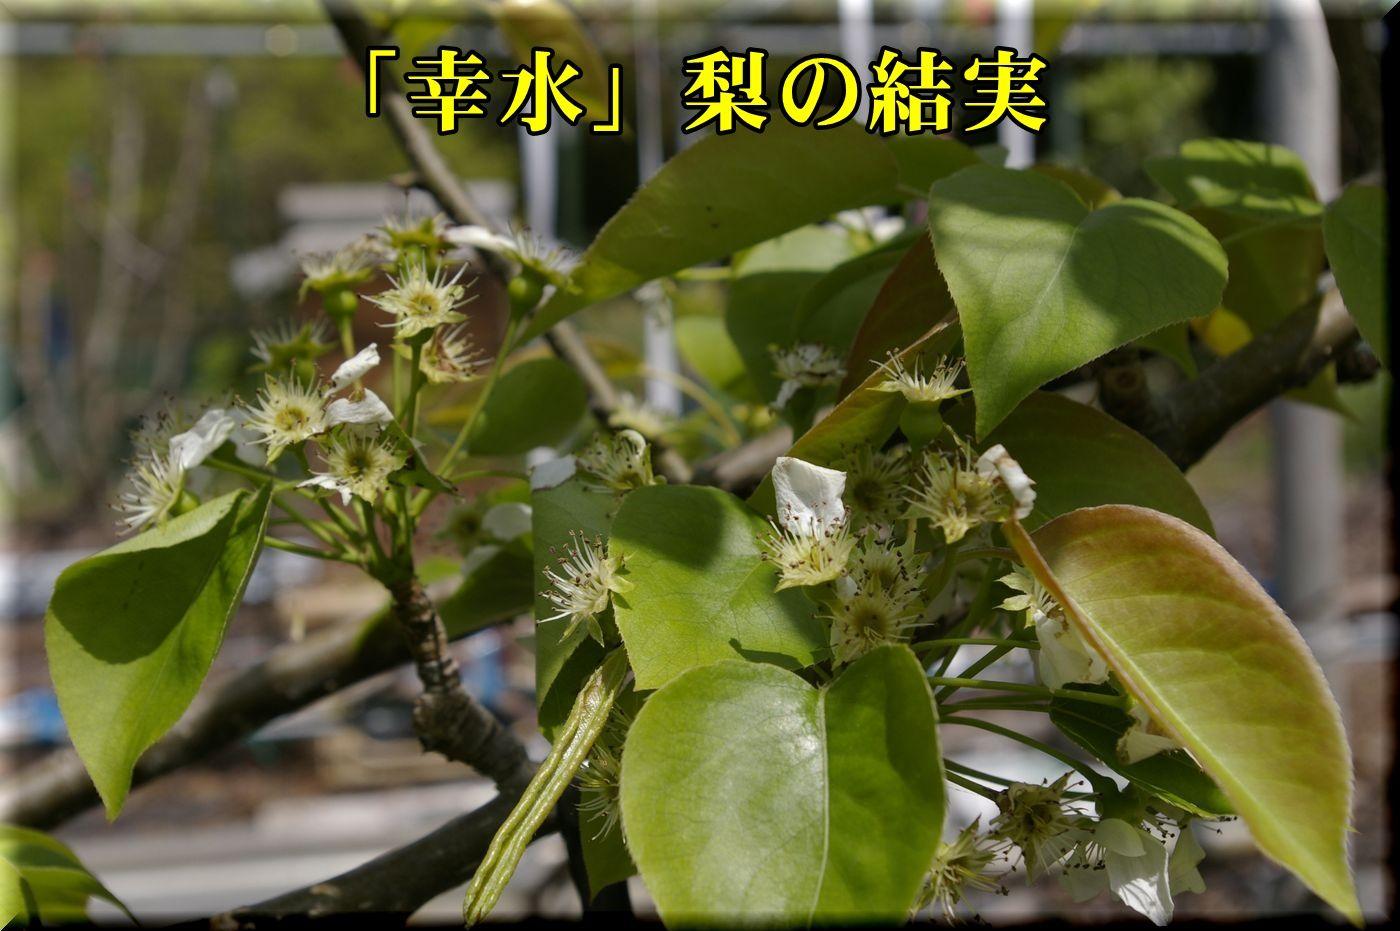 1kousui160418_005.jpg